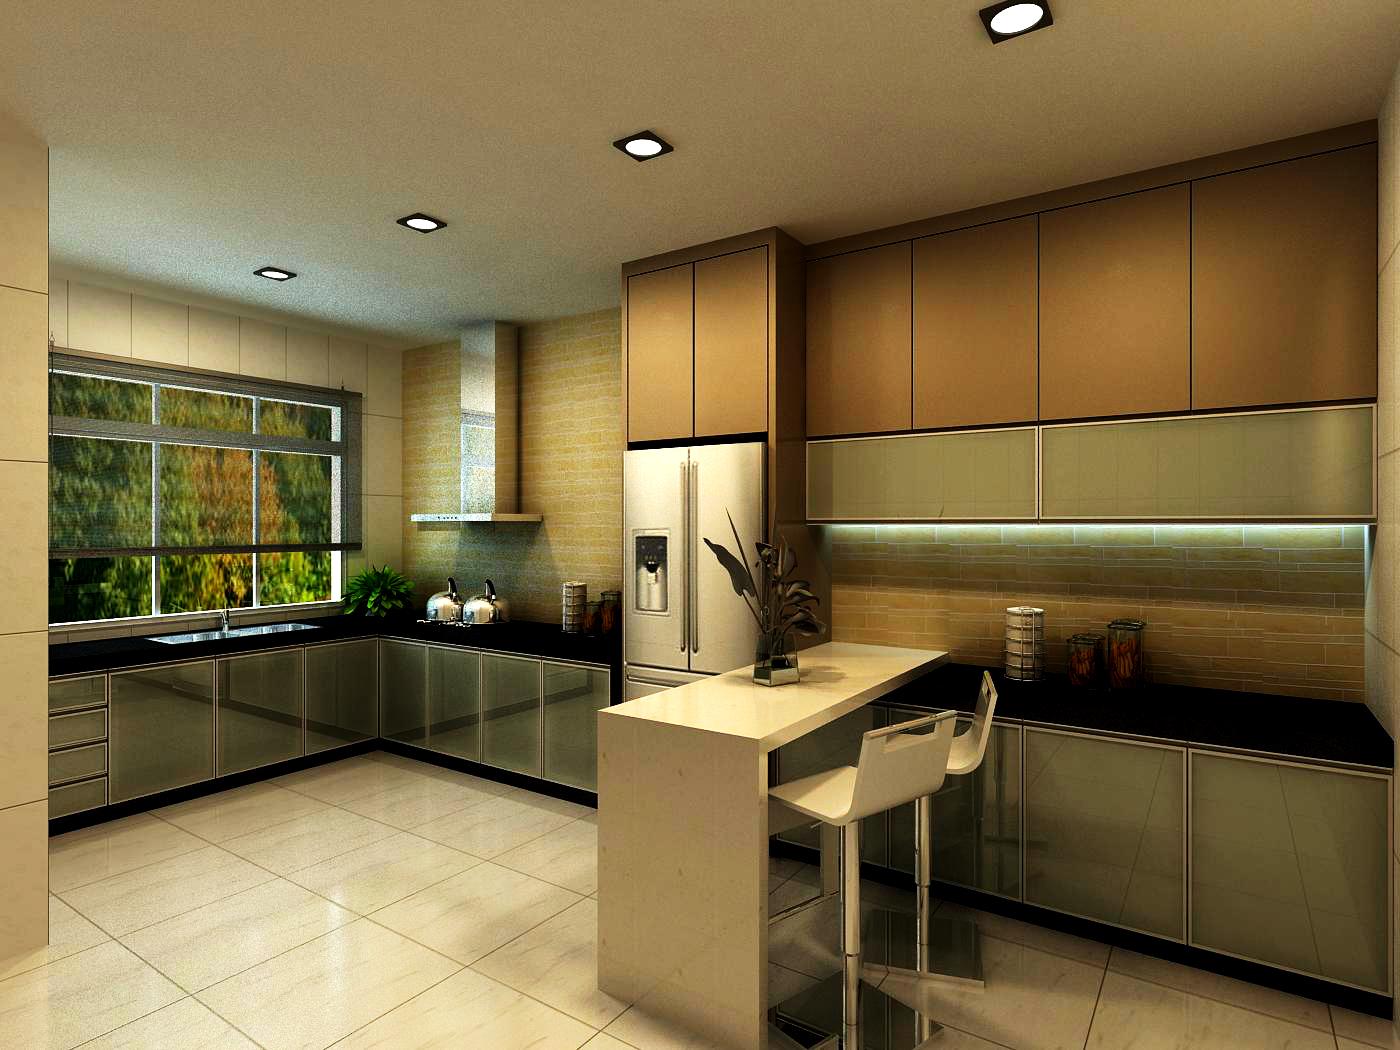 Dry And Wet Kitchen Design Photos